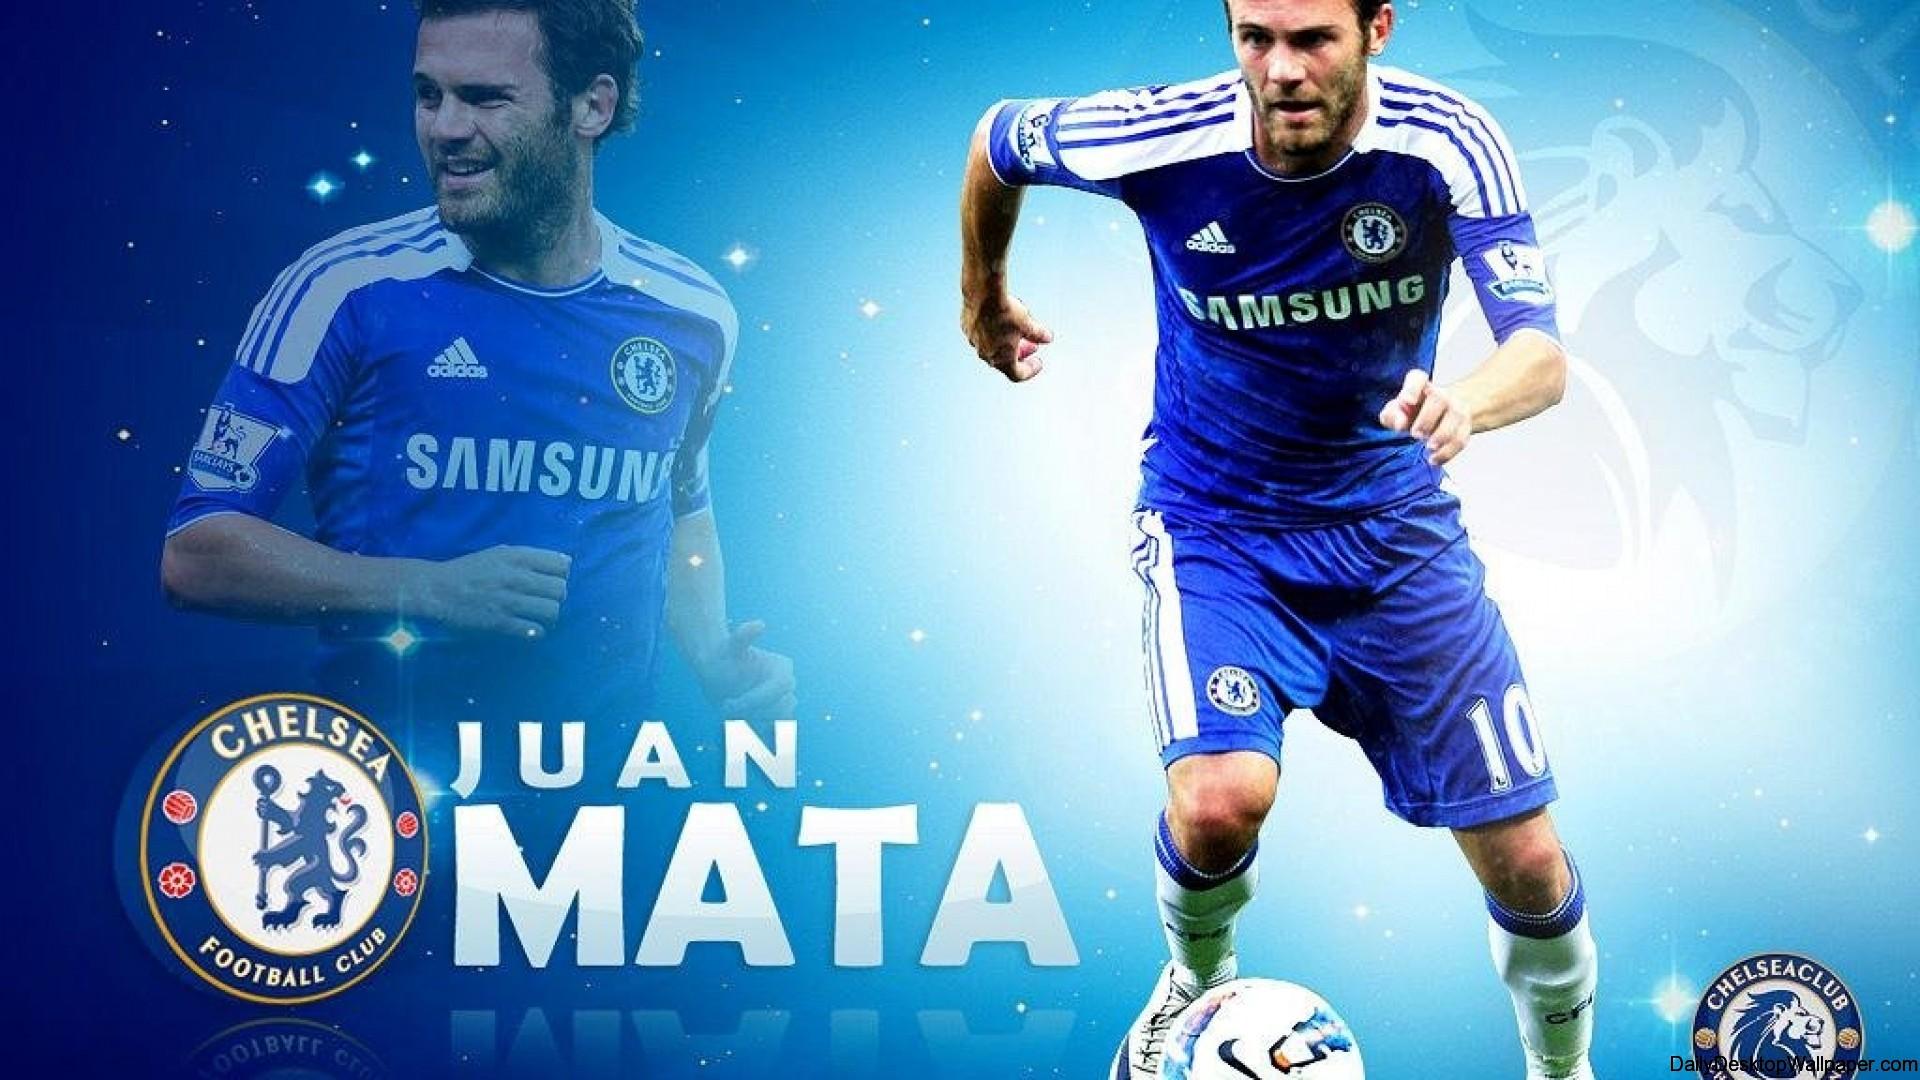 Chelsea-Football-Wallpaper